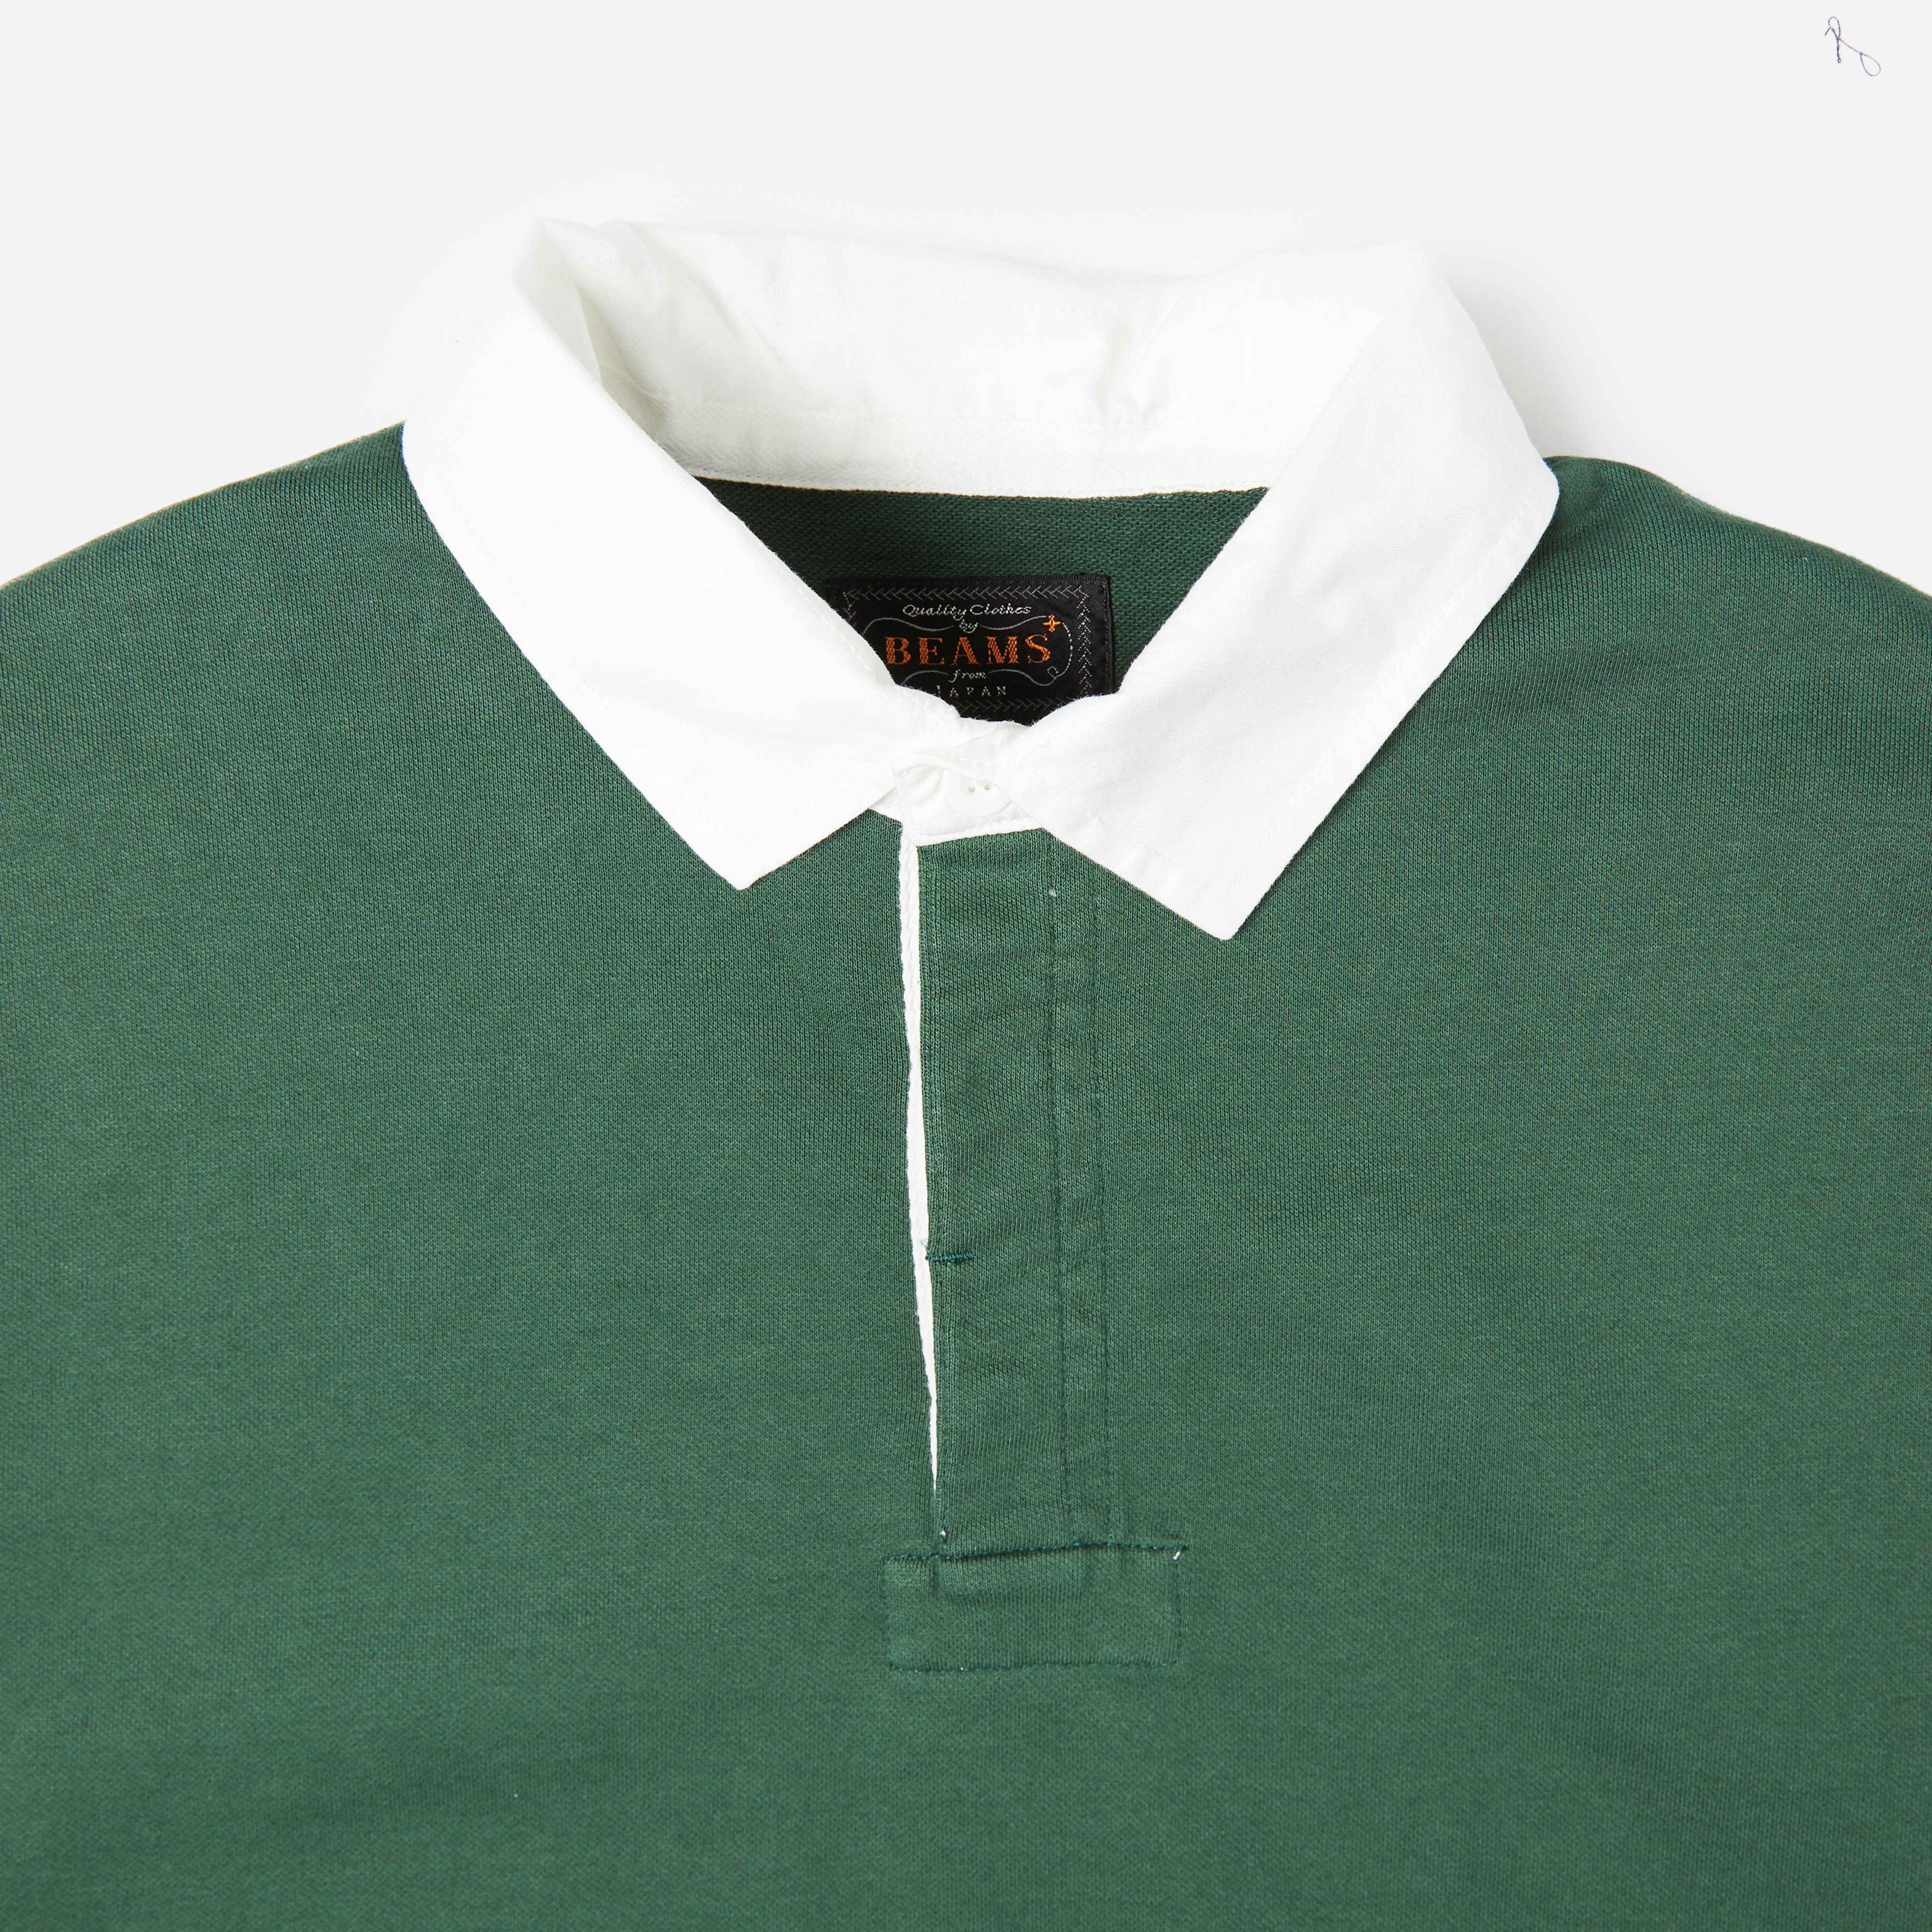 Beams Plus Rugby Shirt